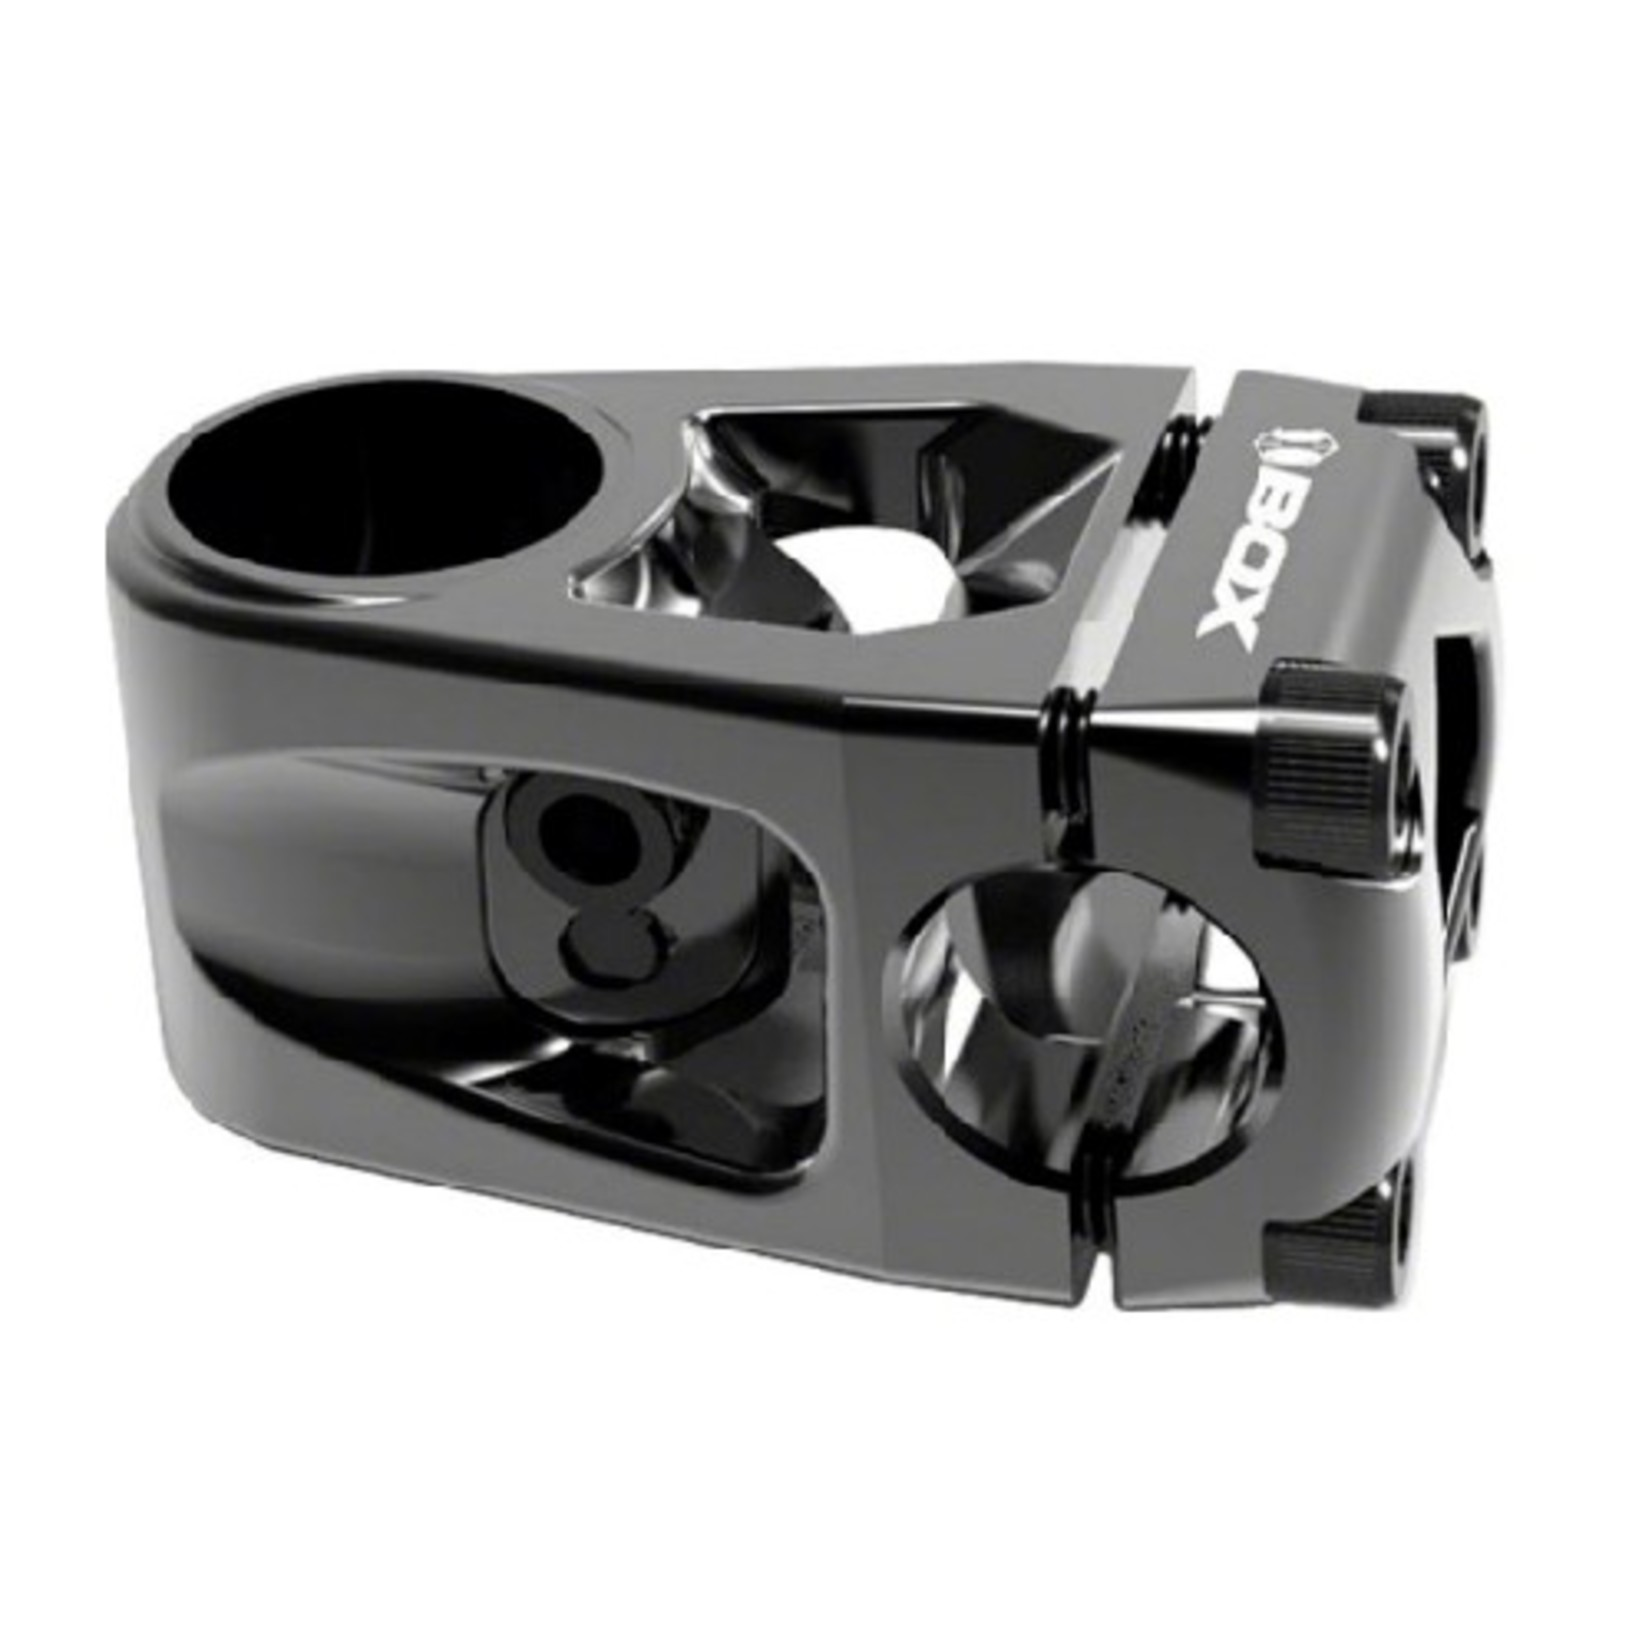 Box Components Box Hollow Stem 22.2mm Bar Clamp